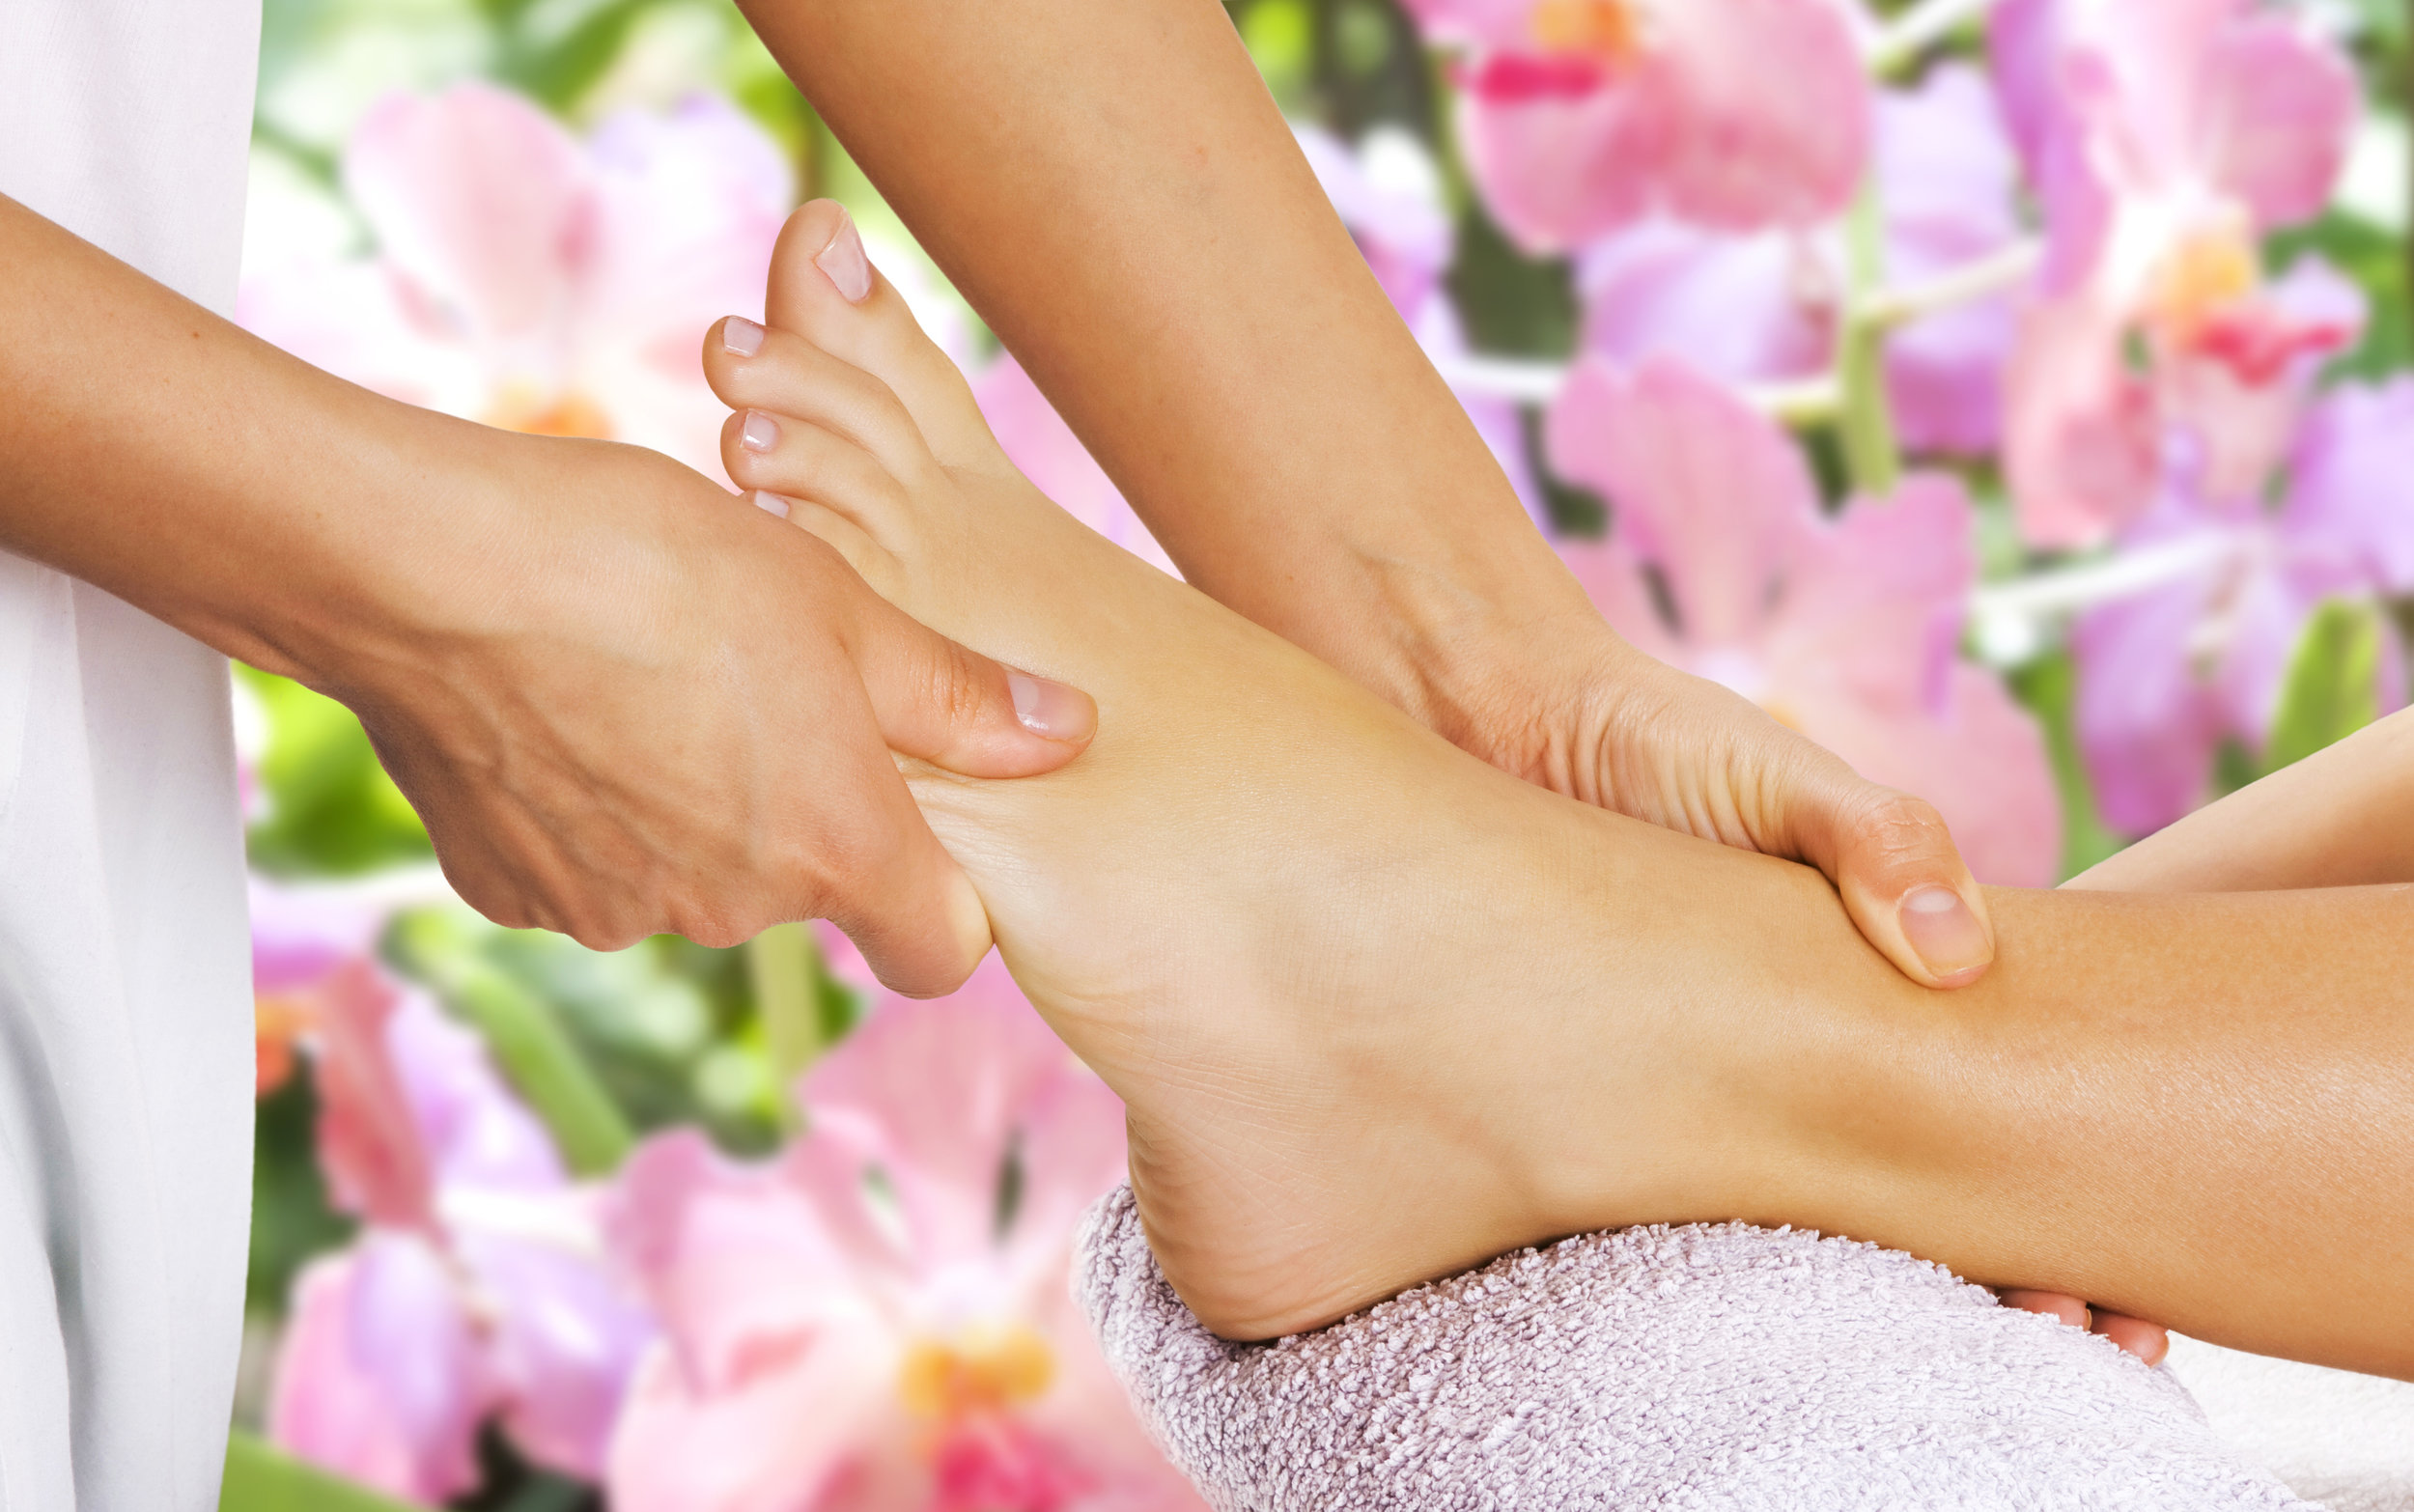 foot reflexology horbuy wakefield healing holistic.jpeg